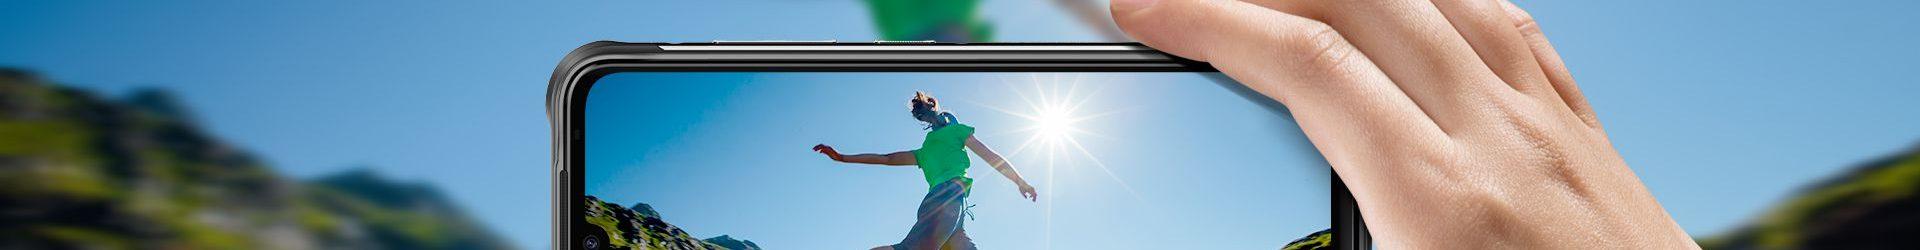 UMIDIGI BISON: un rugged phone con uno stile interessante